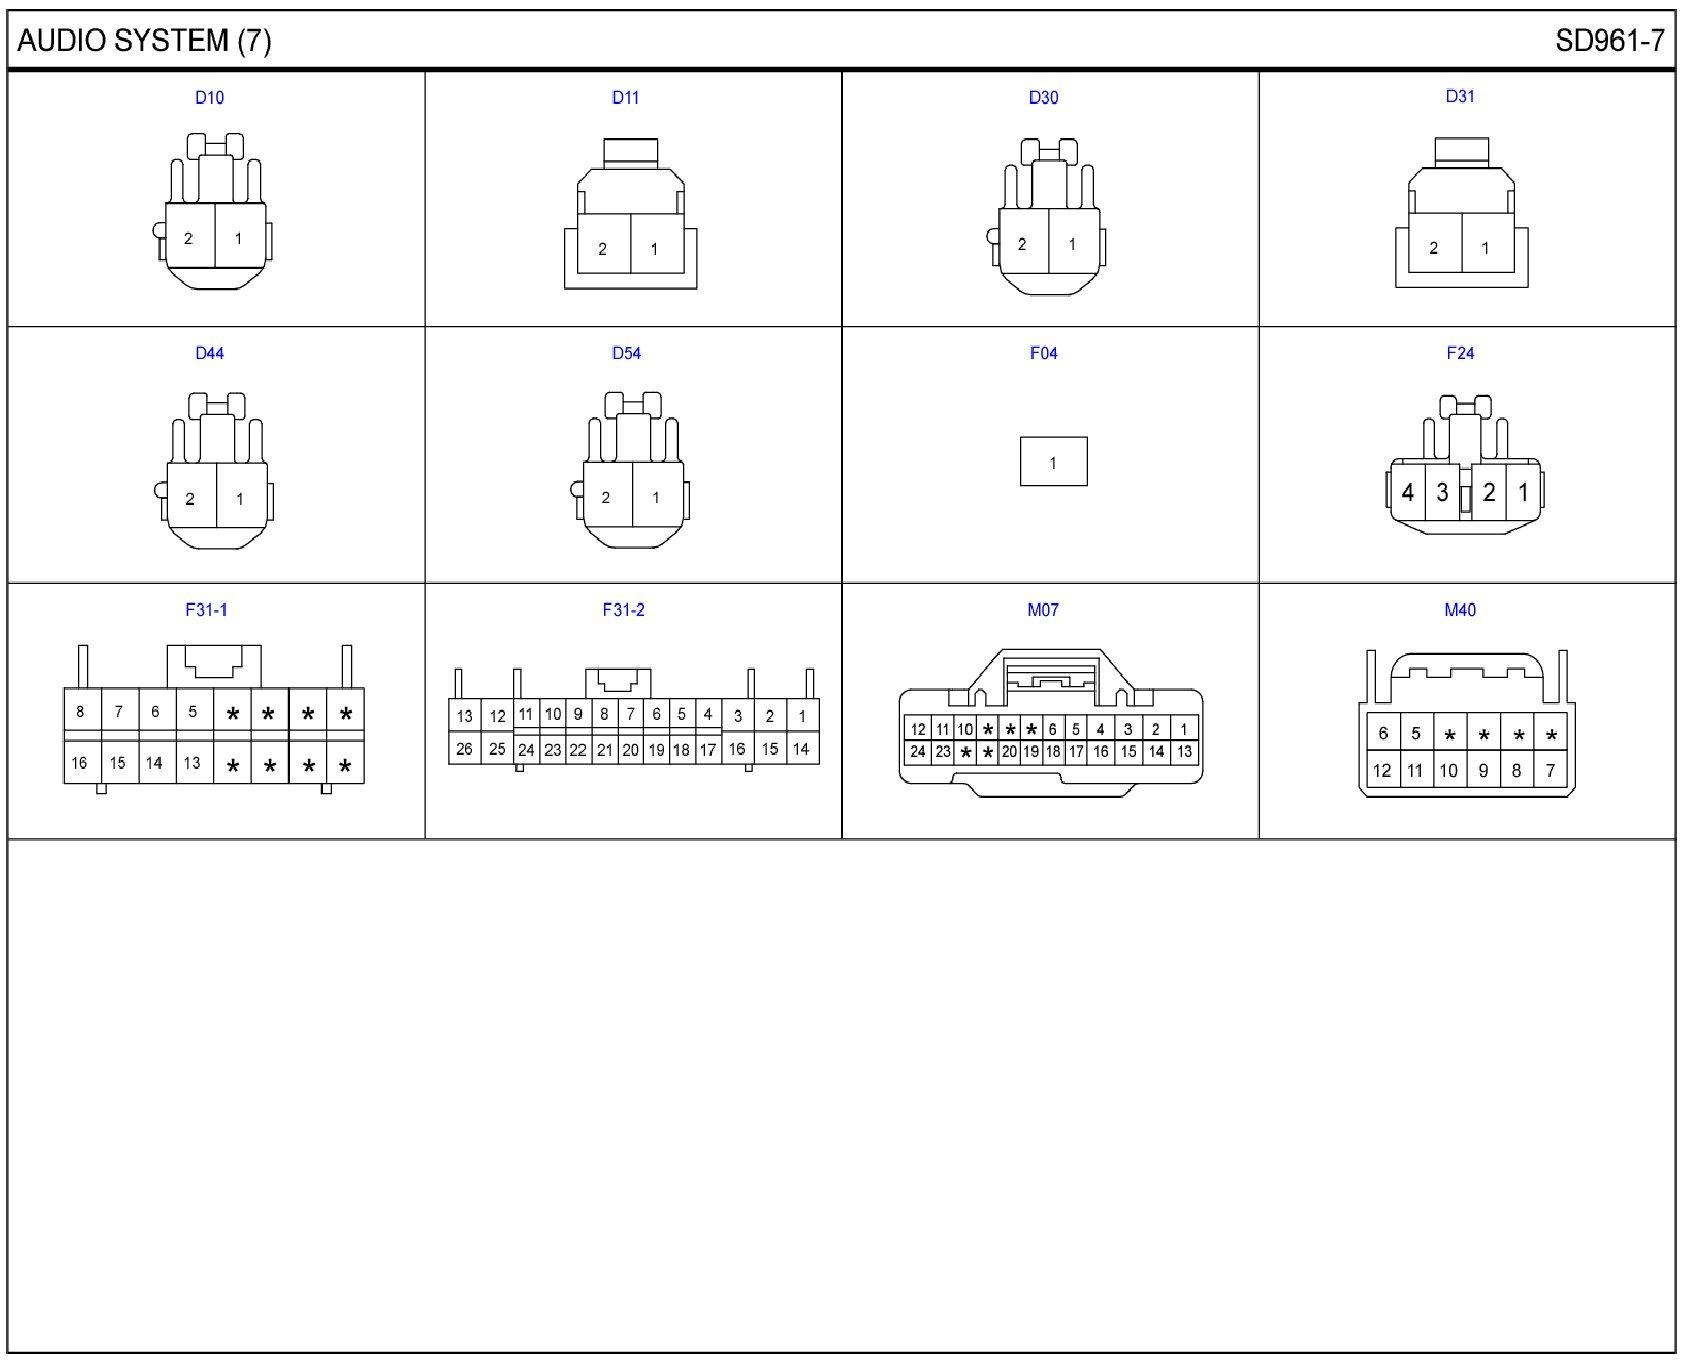 ... 2010 07 03_205420_147880287 infinity 36670 amp wiring diagram wiring  diagrams chrysler infinity amp 36670 wiring diagram